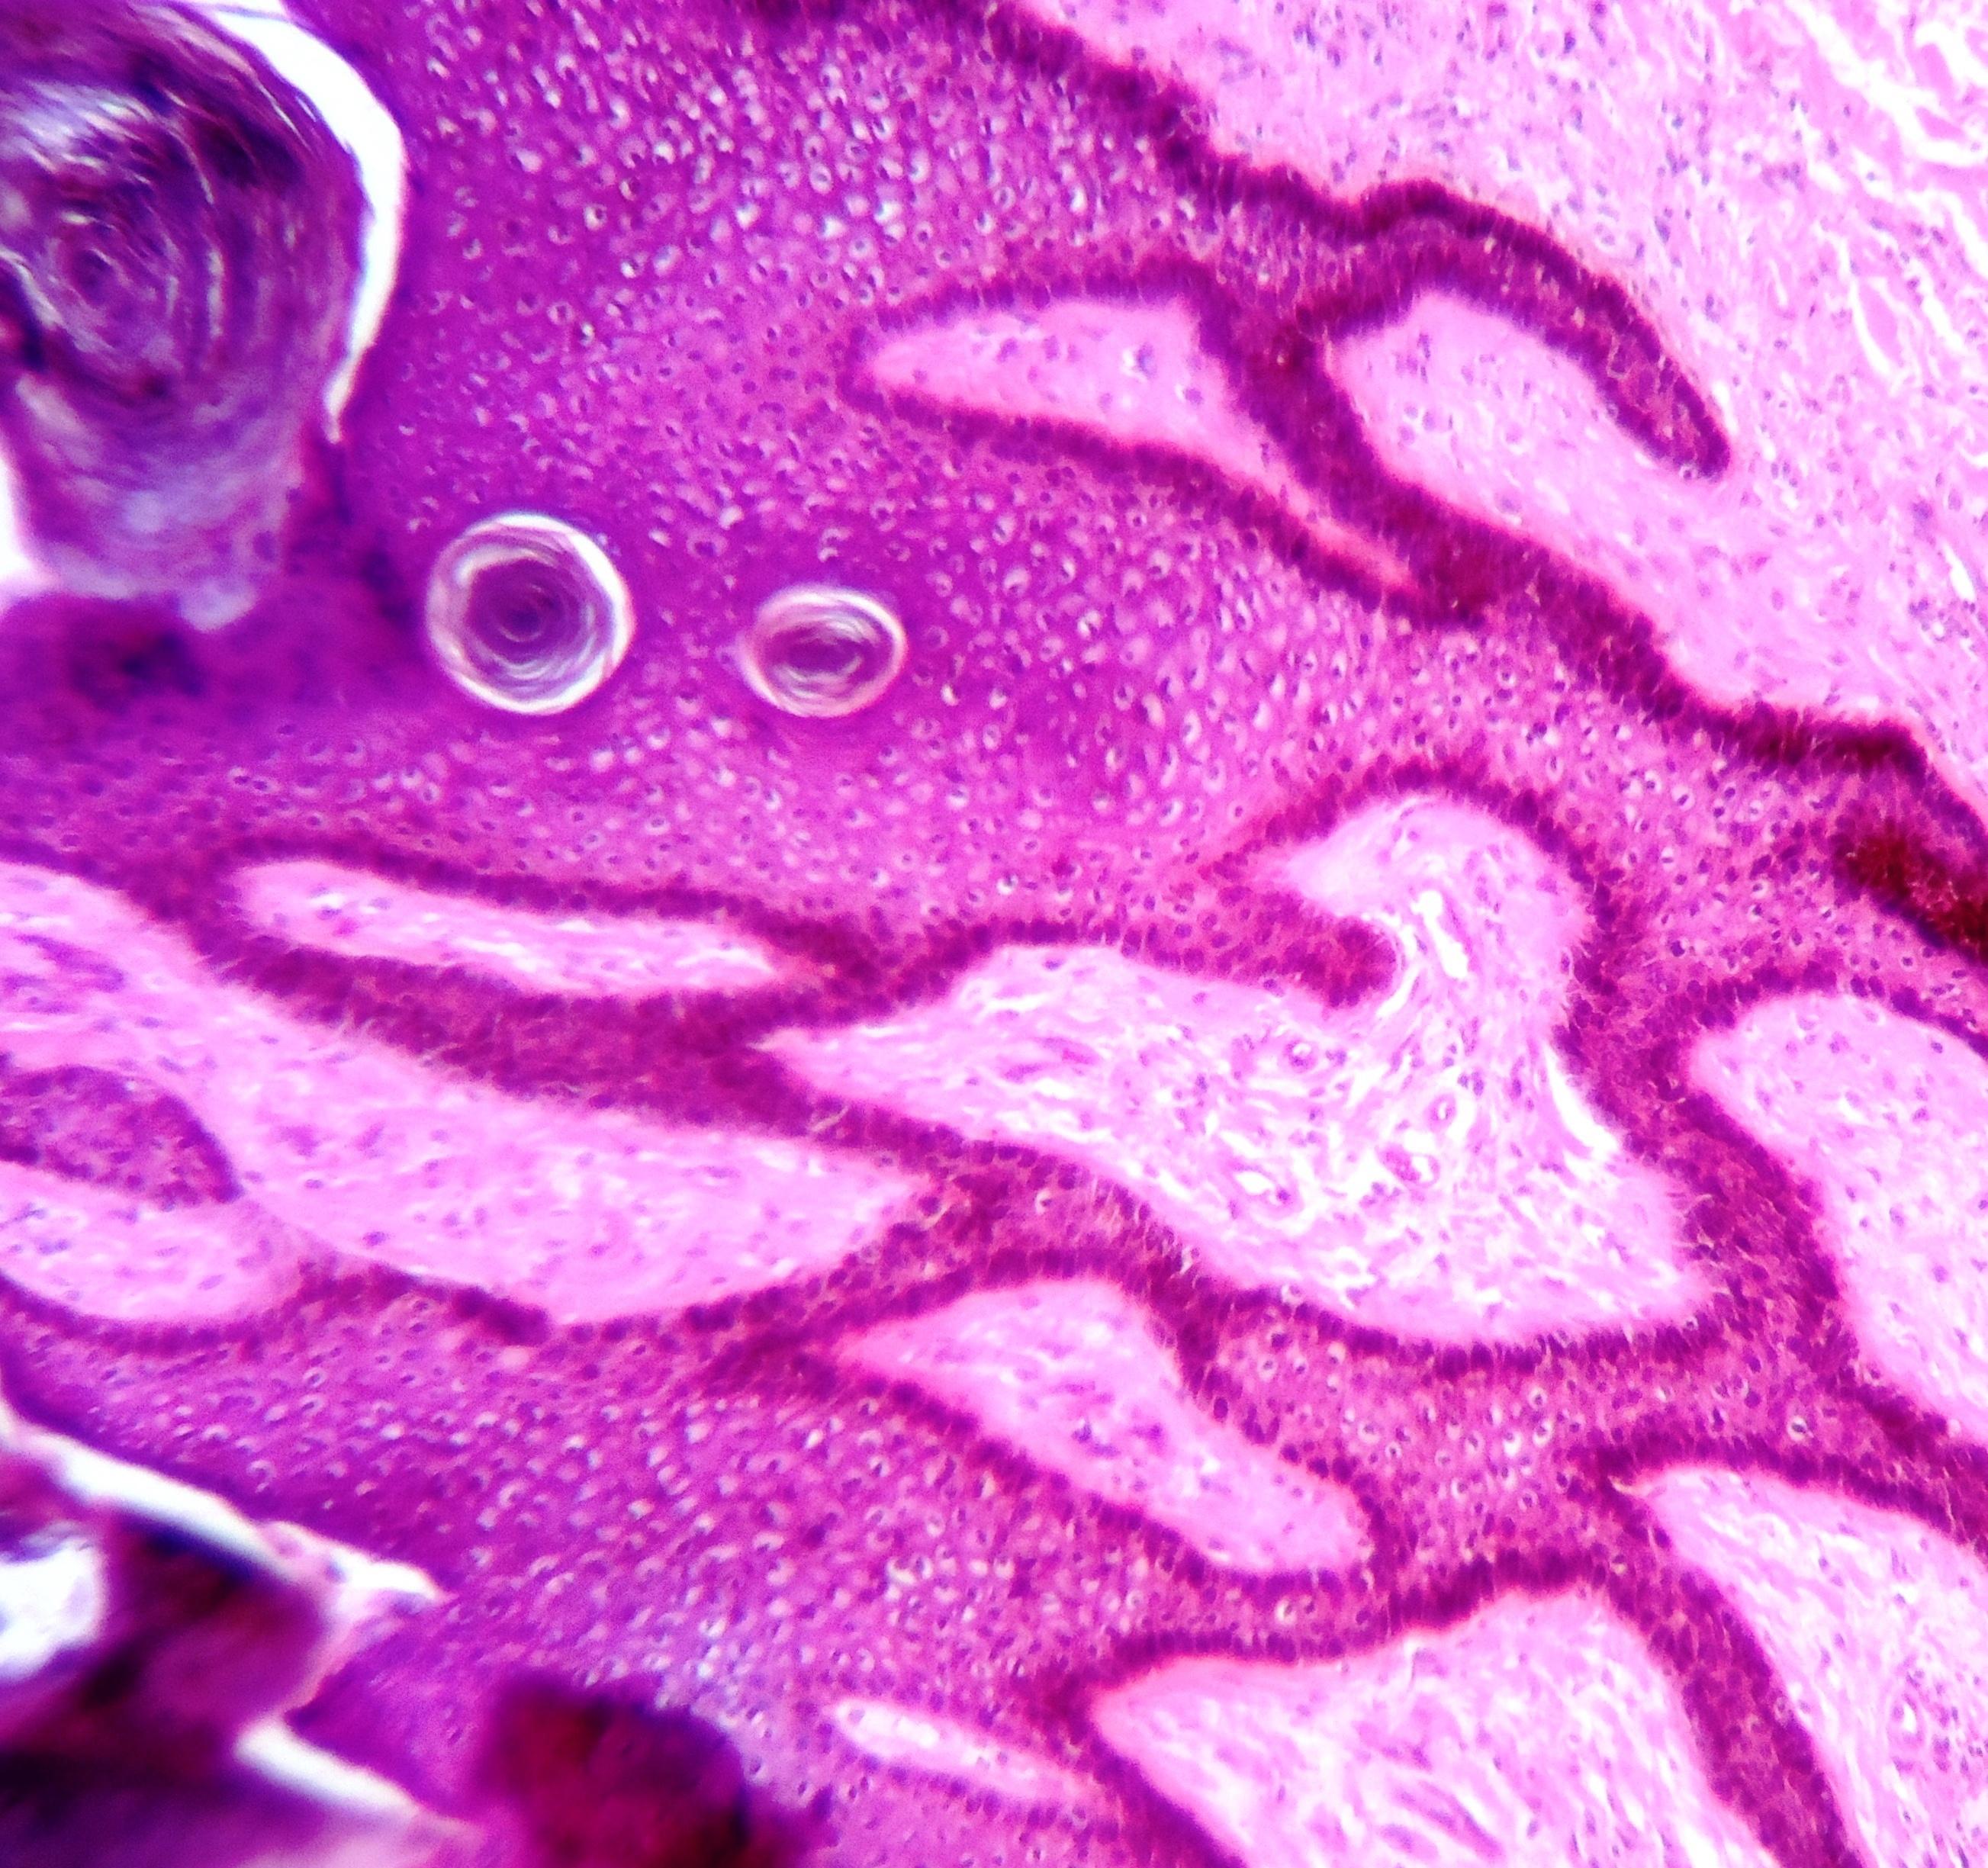 Respiratory papillomatosis pathology outlines Respiratory papillomatosis pathology outlines